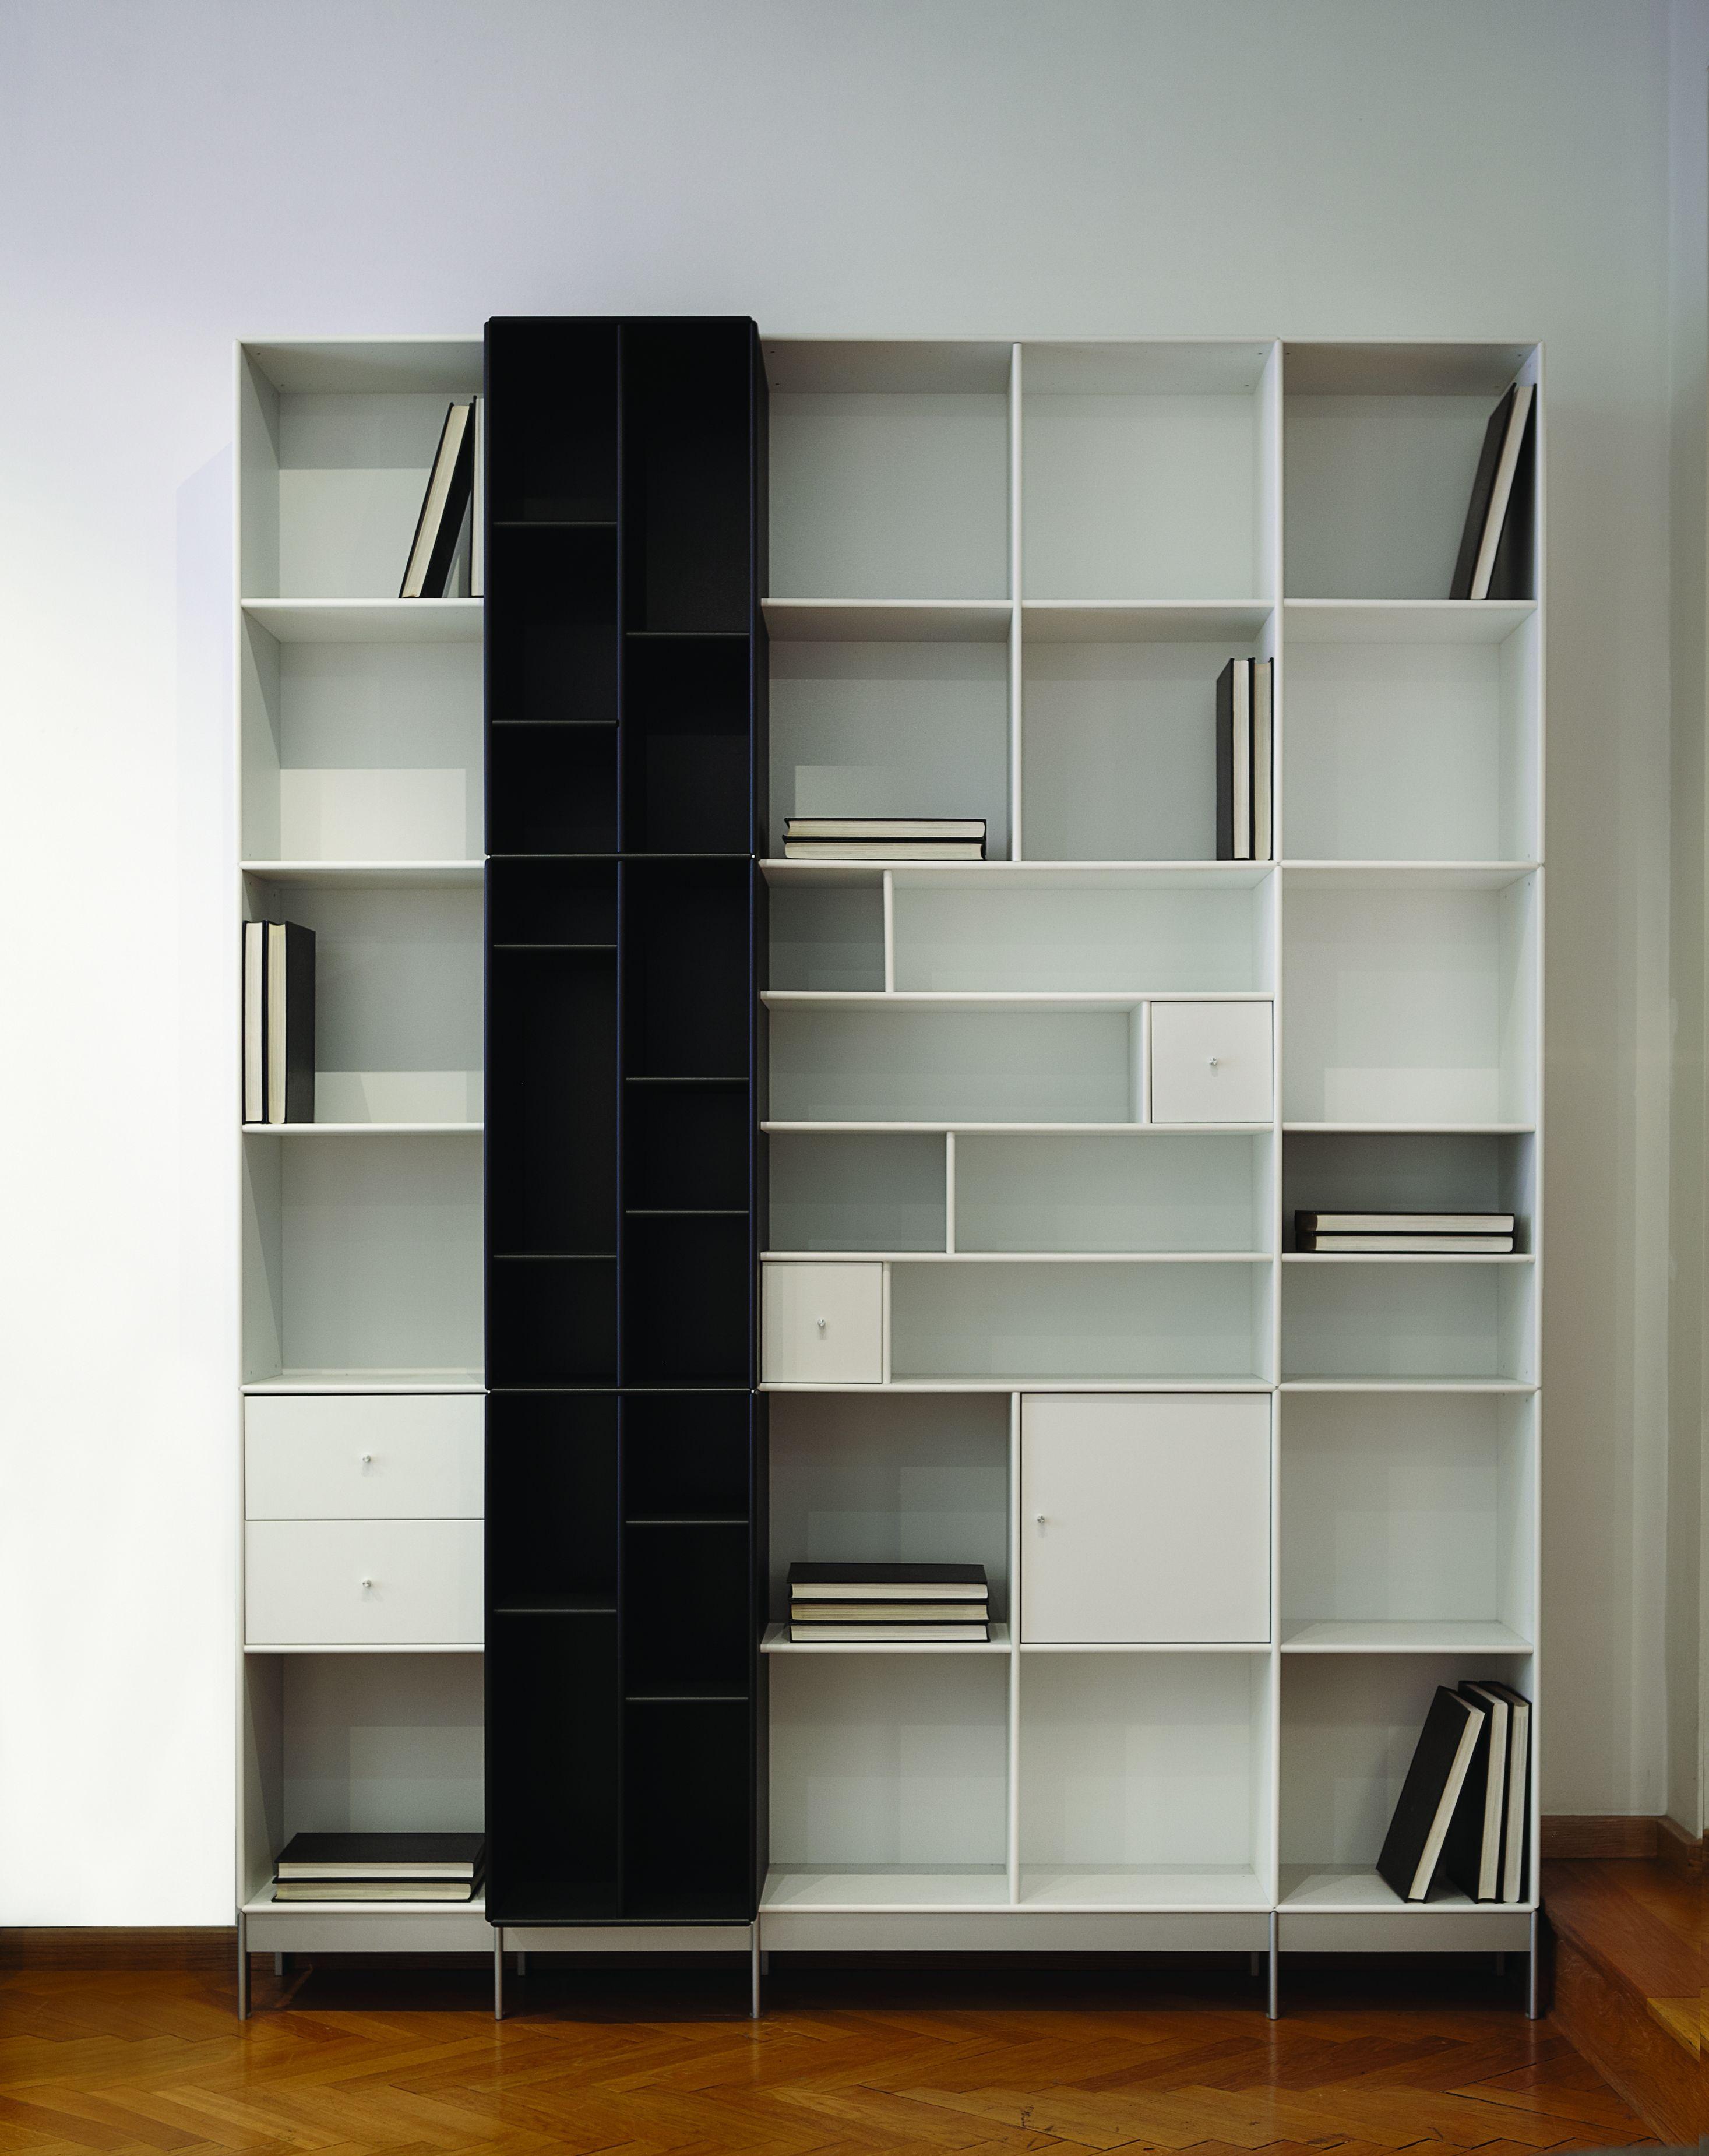 Lundia Open Boekenkast.Boekenkast In Zwart En Wit Met Diepteverdeling Abc Quadrant